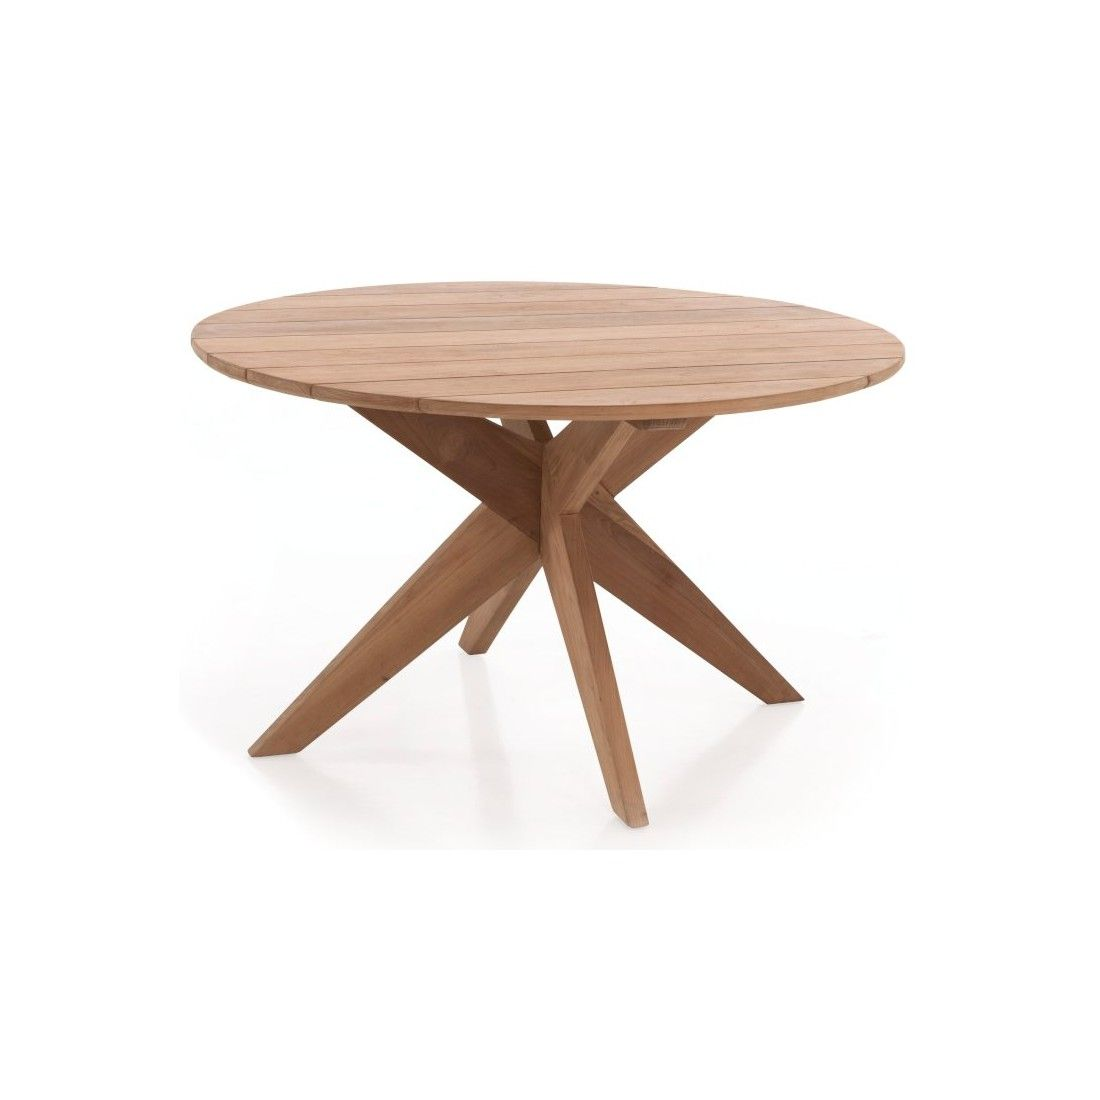 Table de jardin ronde en teck massif 165 cm, Java